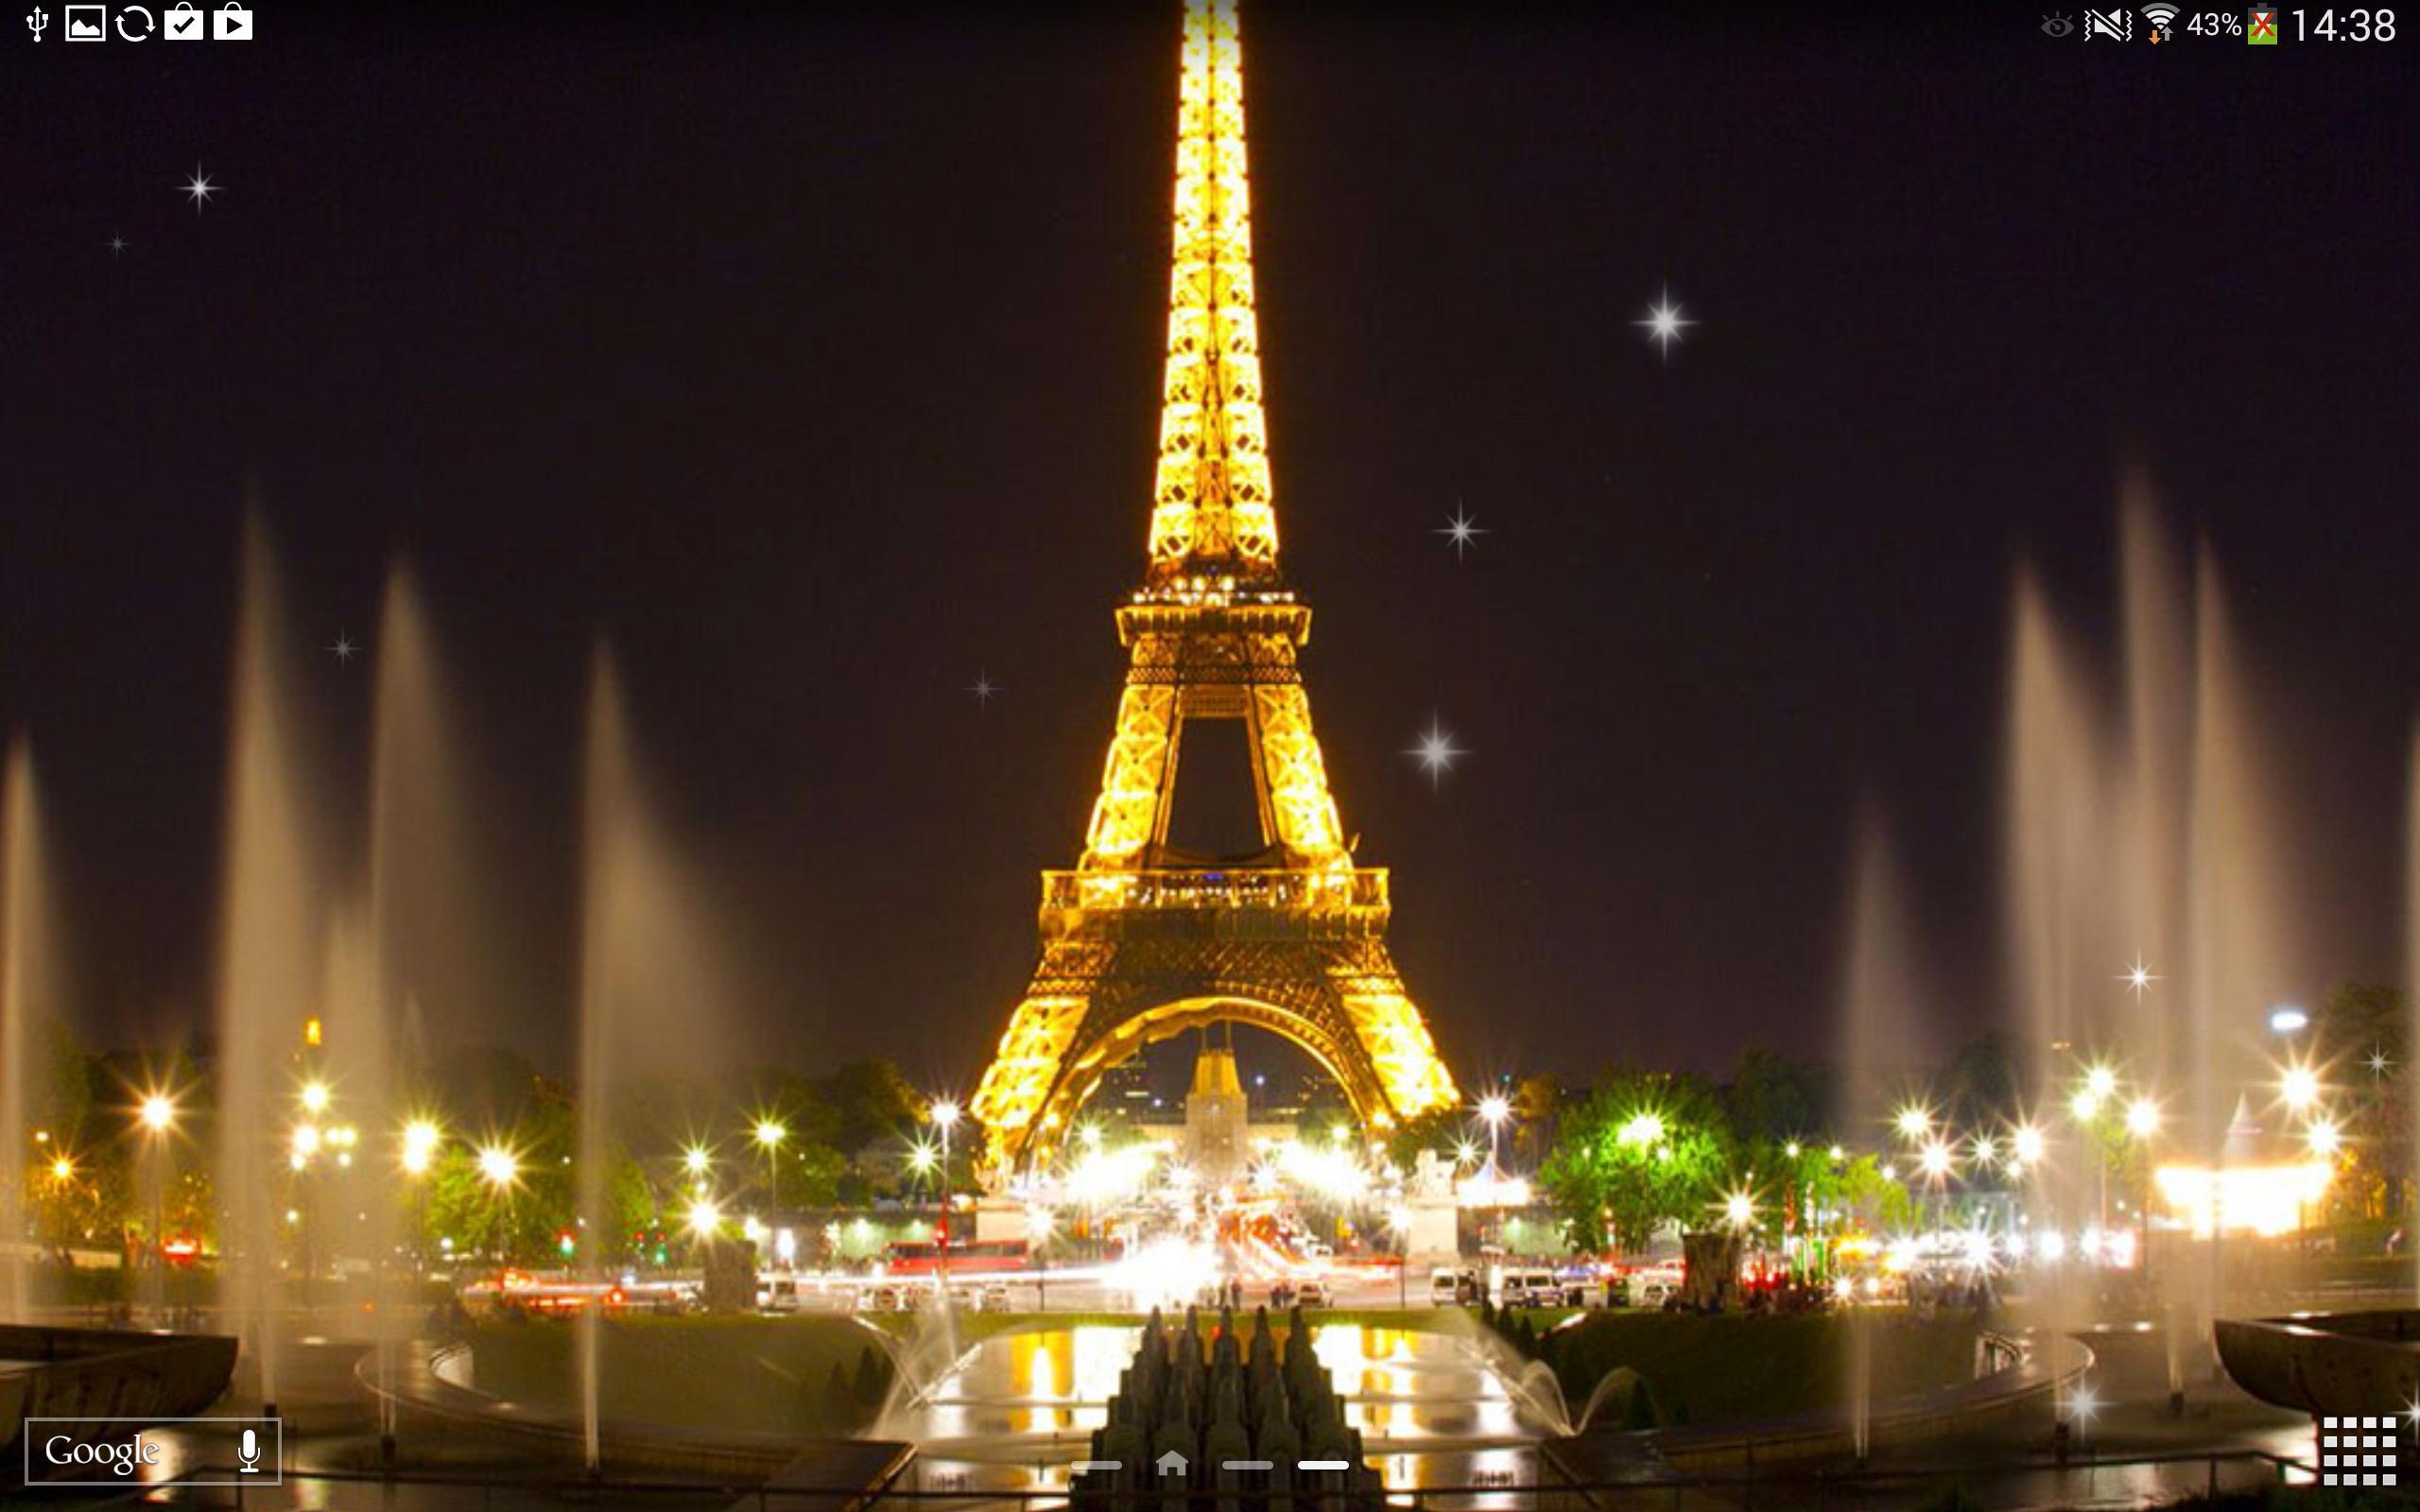 Menara Eiffel Paris For Android APK Download